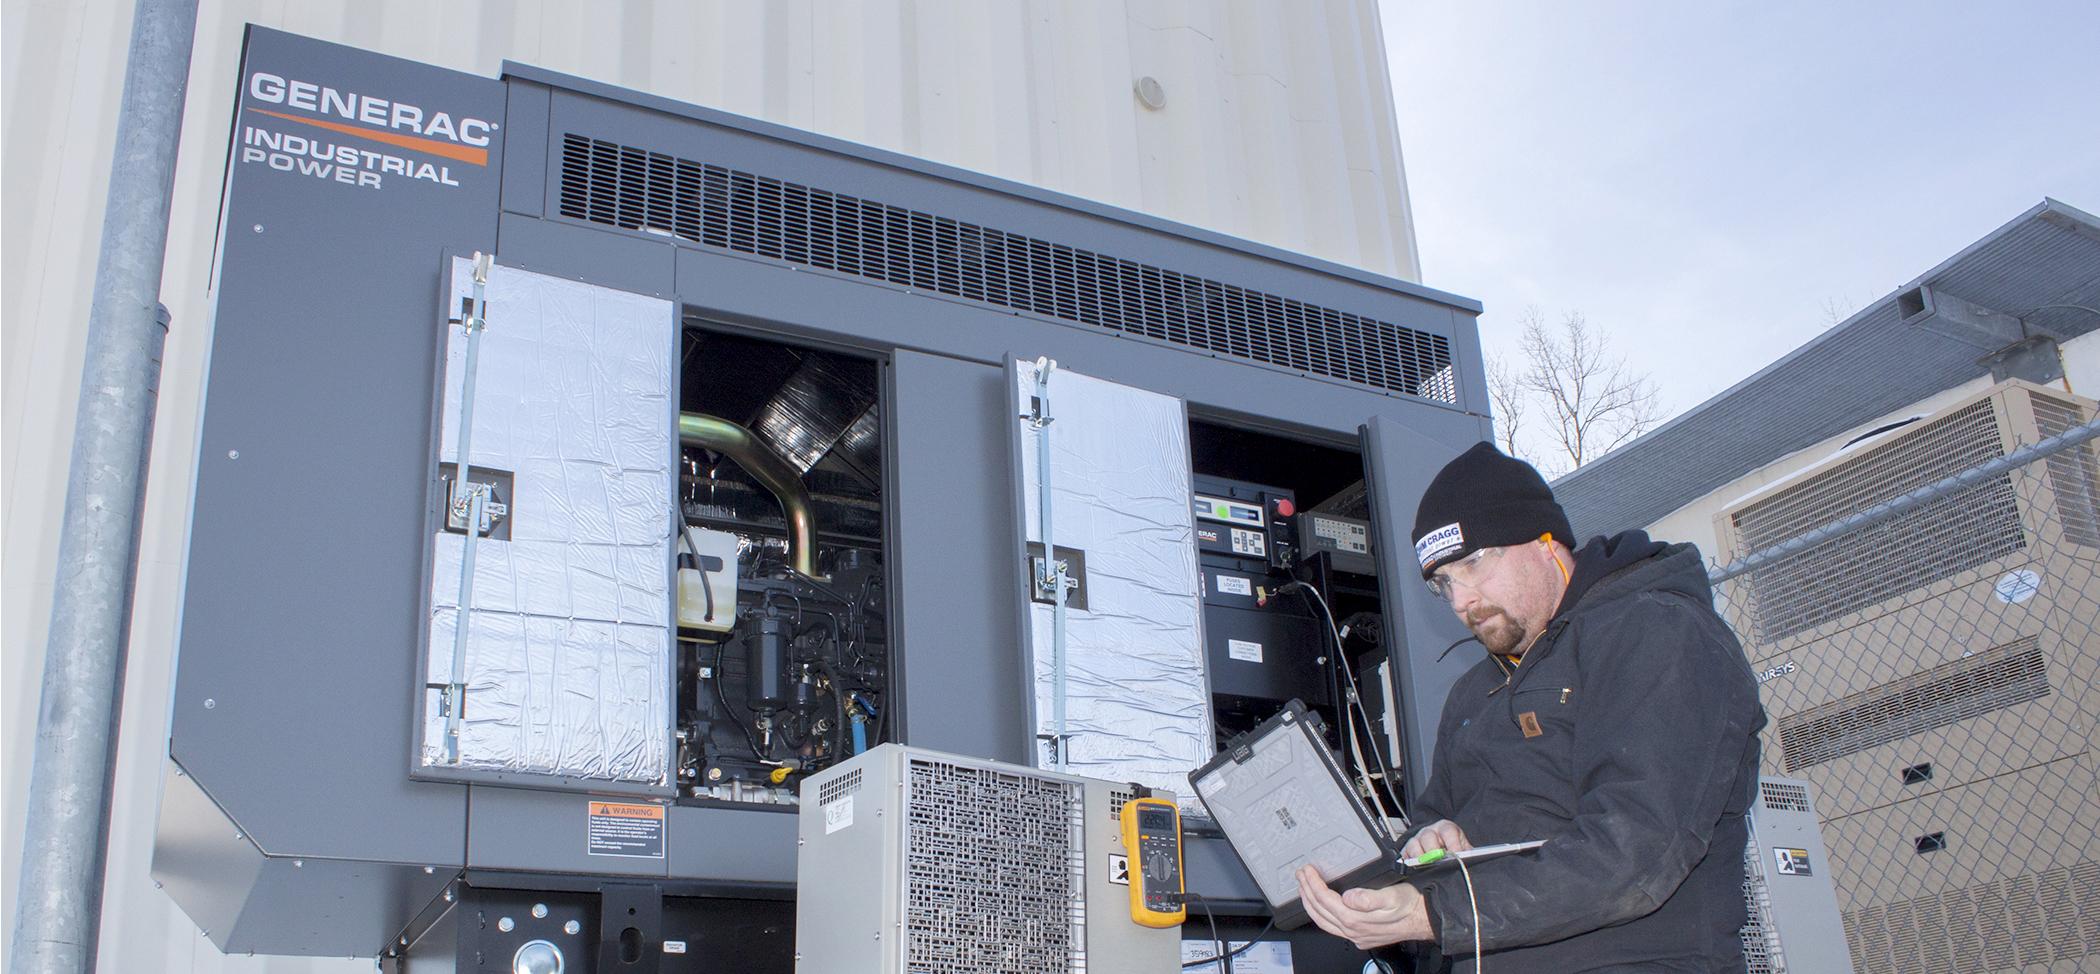 HM Cragg employee working on generator